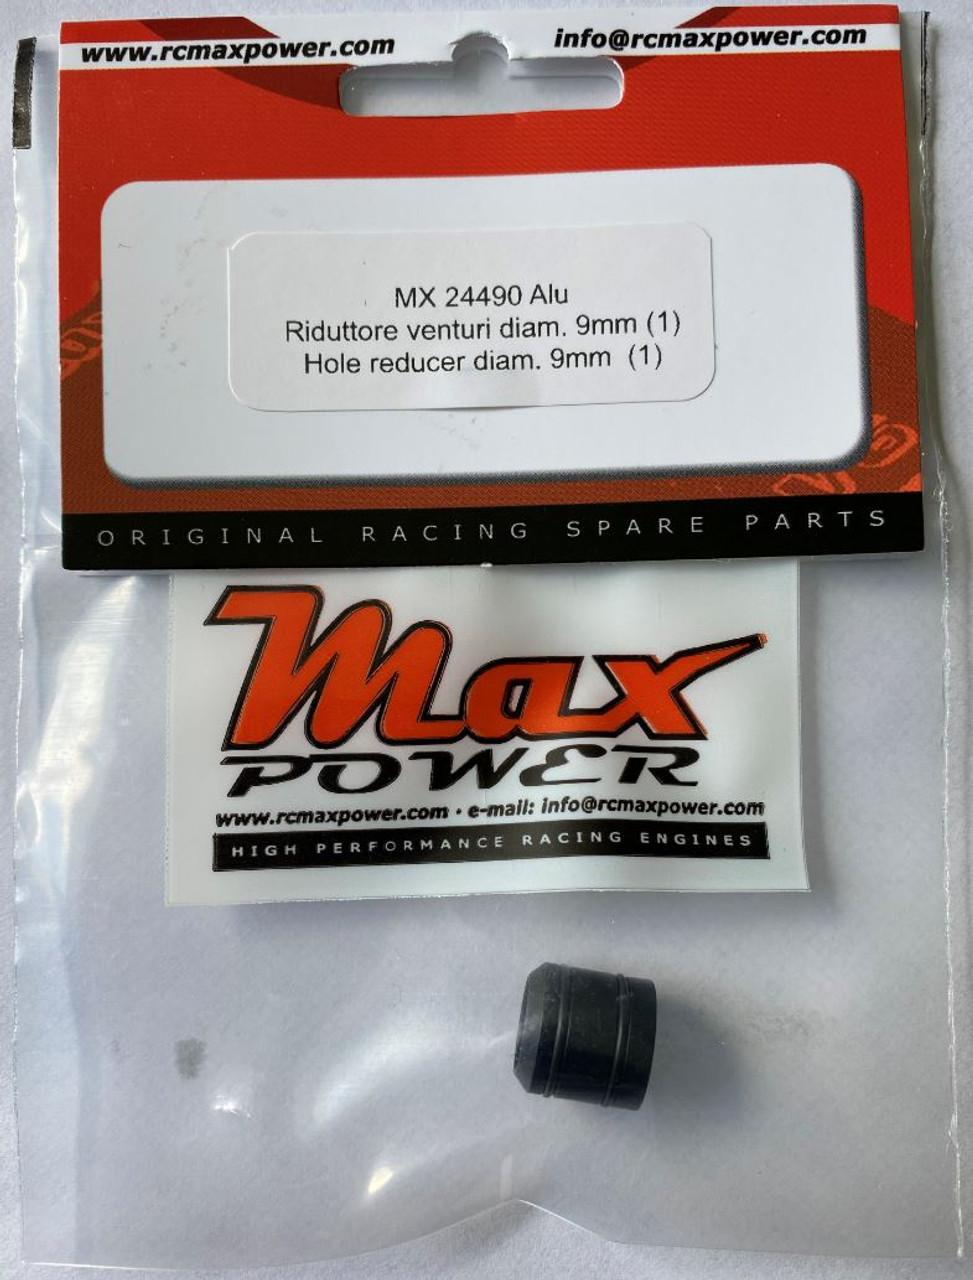 Max Power - 9mm Venturi